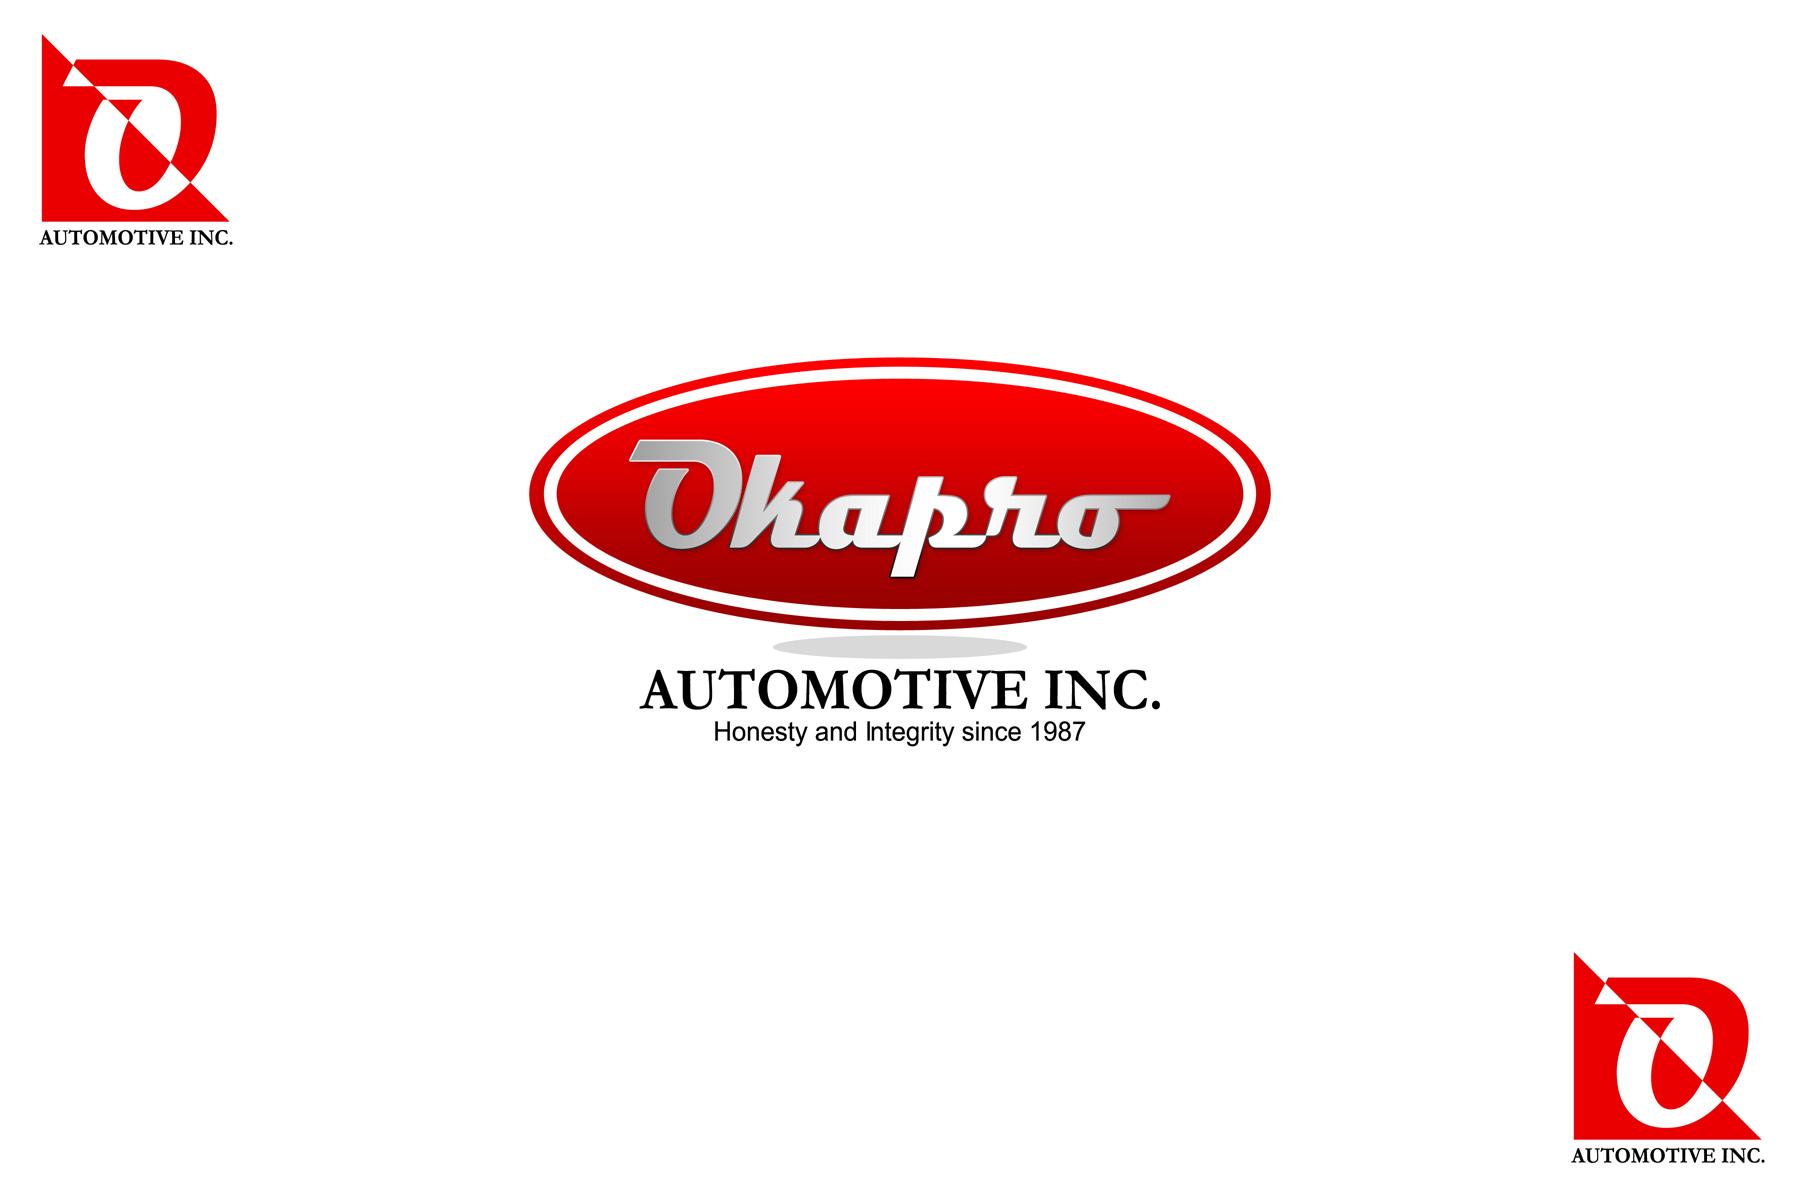 Logo Design by Private User - Entry No. 72 in the Logo Design Contest New Logo Design for Okapro  Automotive  Inc.